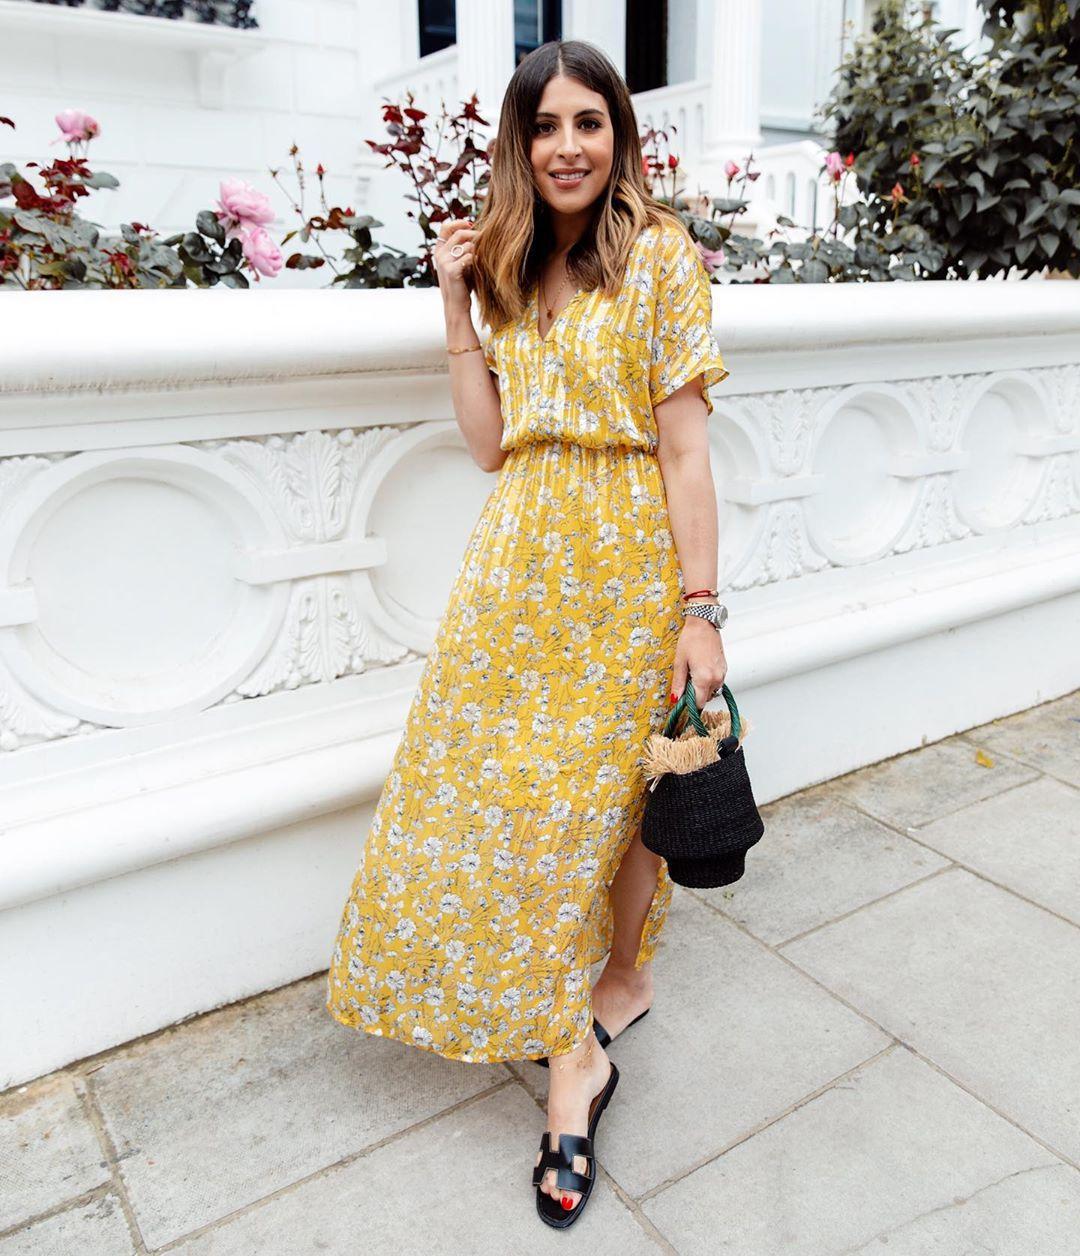 dress yellow dress maxi dress floral dress short sleeve dress slide shoes black bag handbag